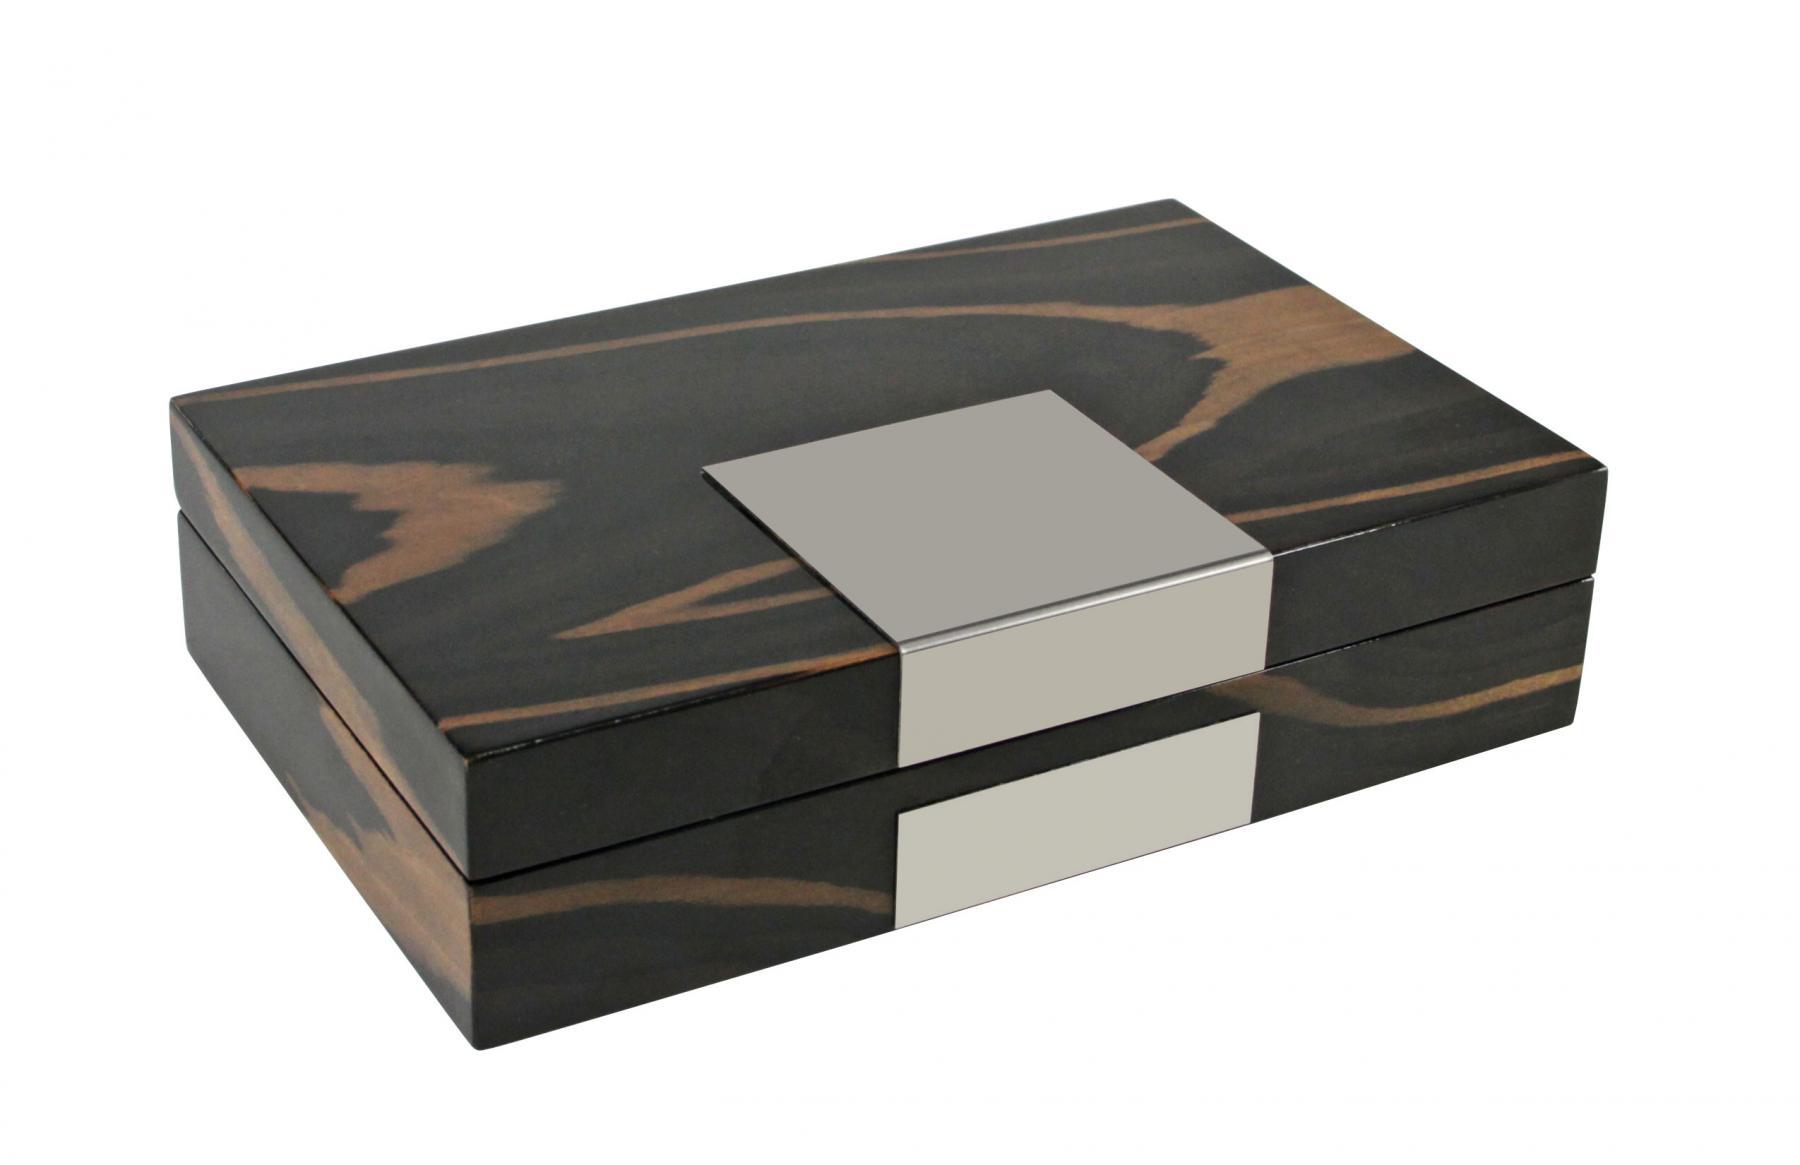 safe 7986 dunkle design holz hochglanz schmuckschatulle schmuckkassette uhrenschatulle. Black Bedroom Furniture Sets. Home Design Ideas